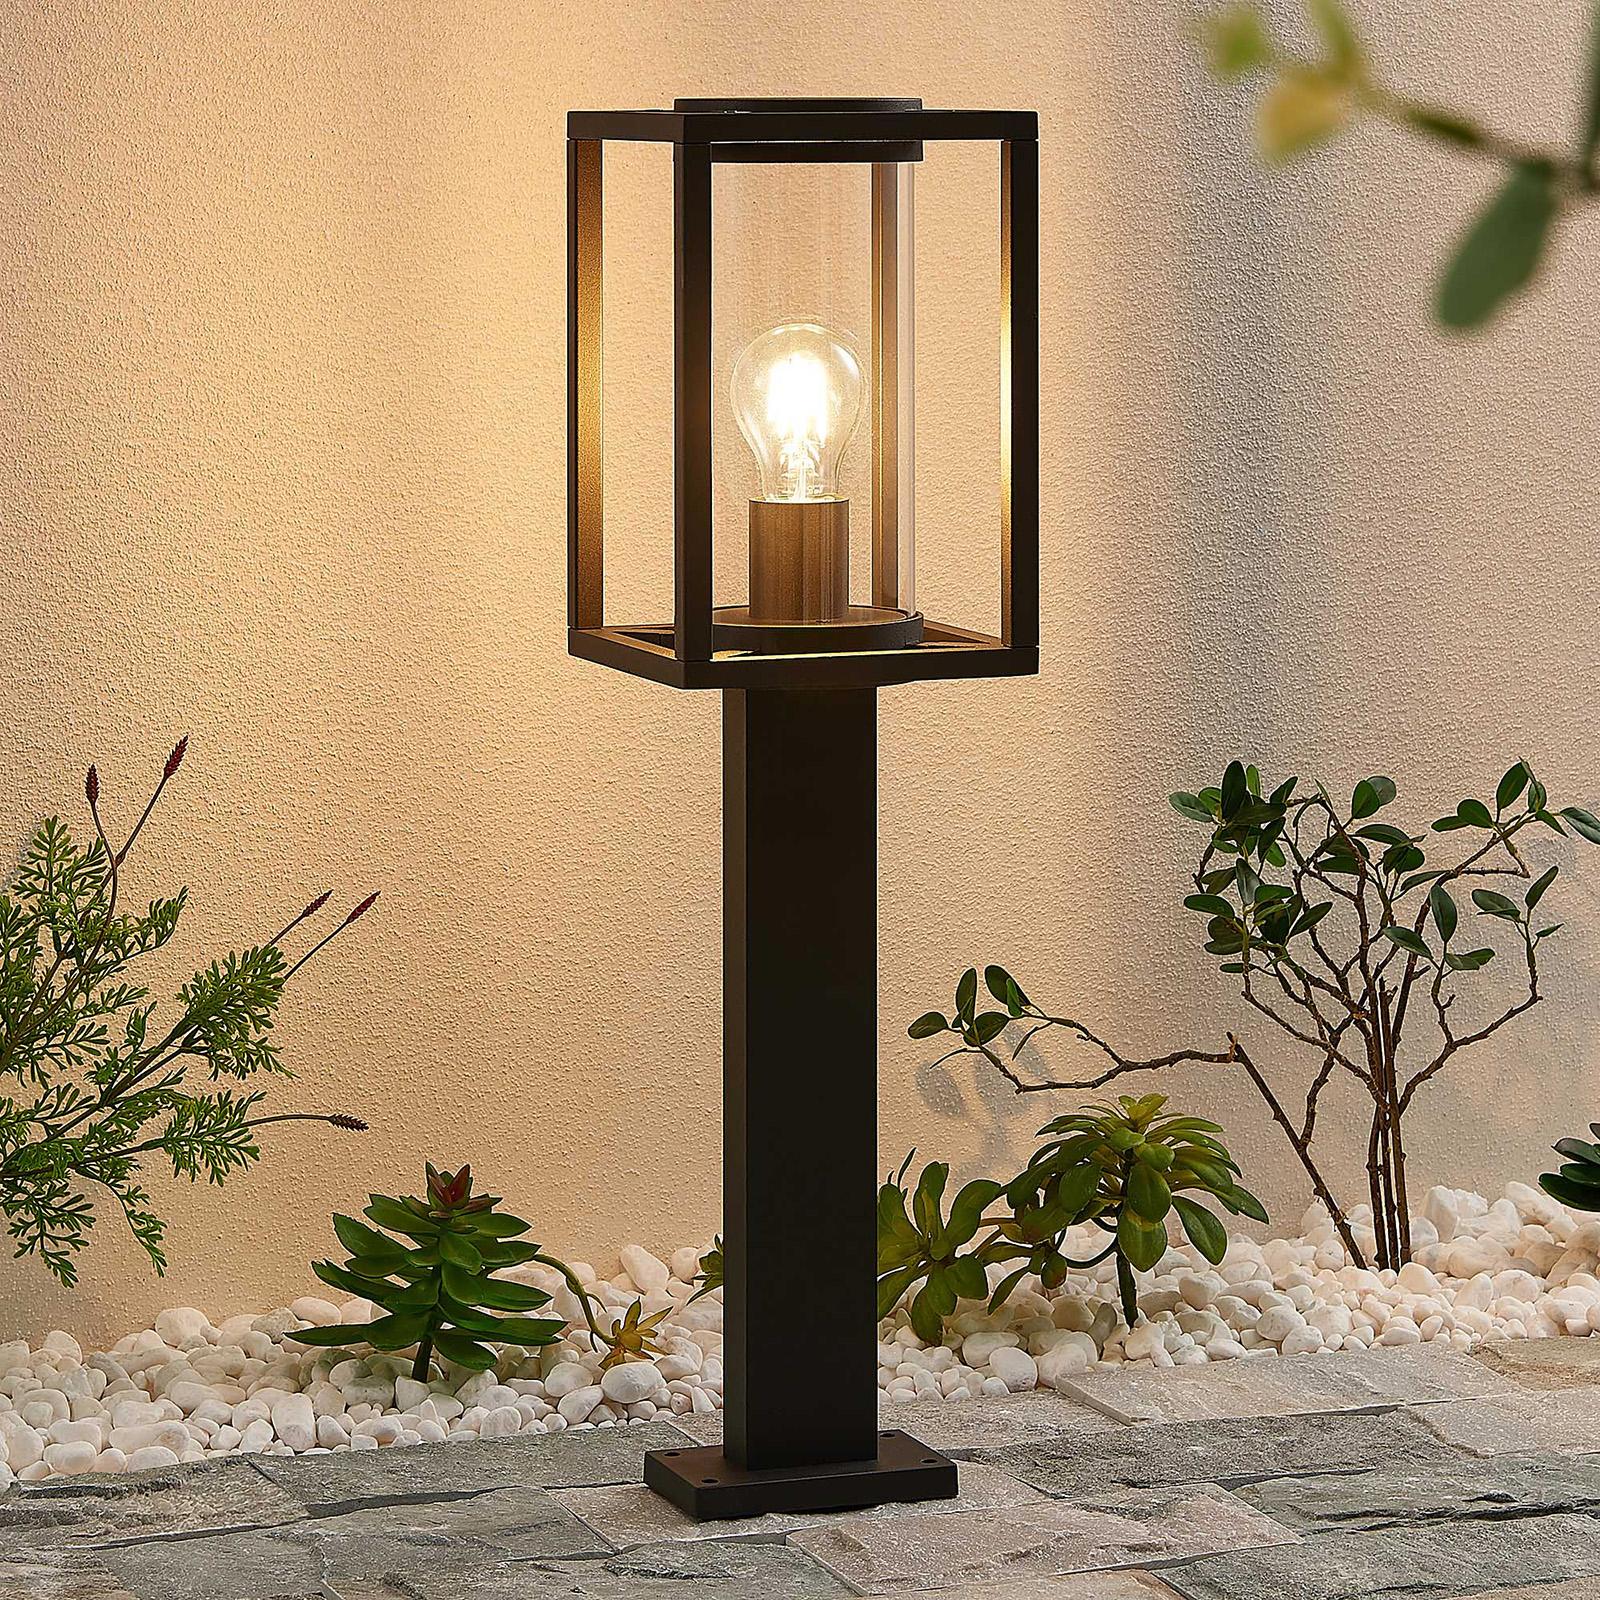 Lucande Ferda veilampe, 60 cm høy